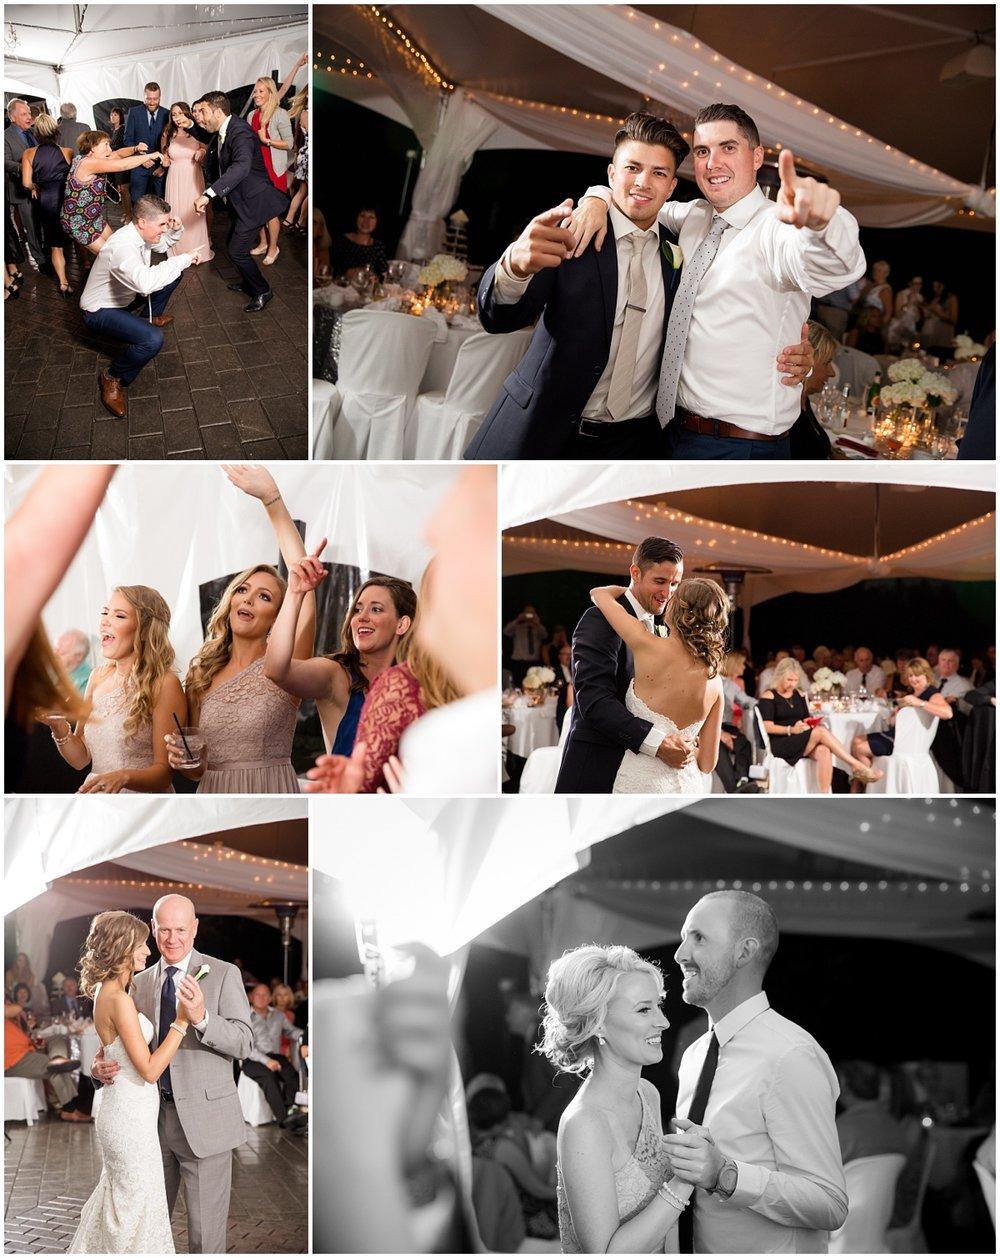 Amazing Day Photography - Redwoods Golf Course Wedding - Amanda and Dustin - Langley Wedding Photographer  (34).jpg